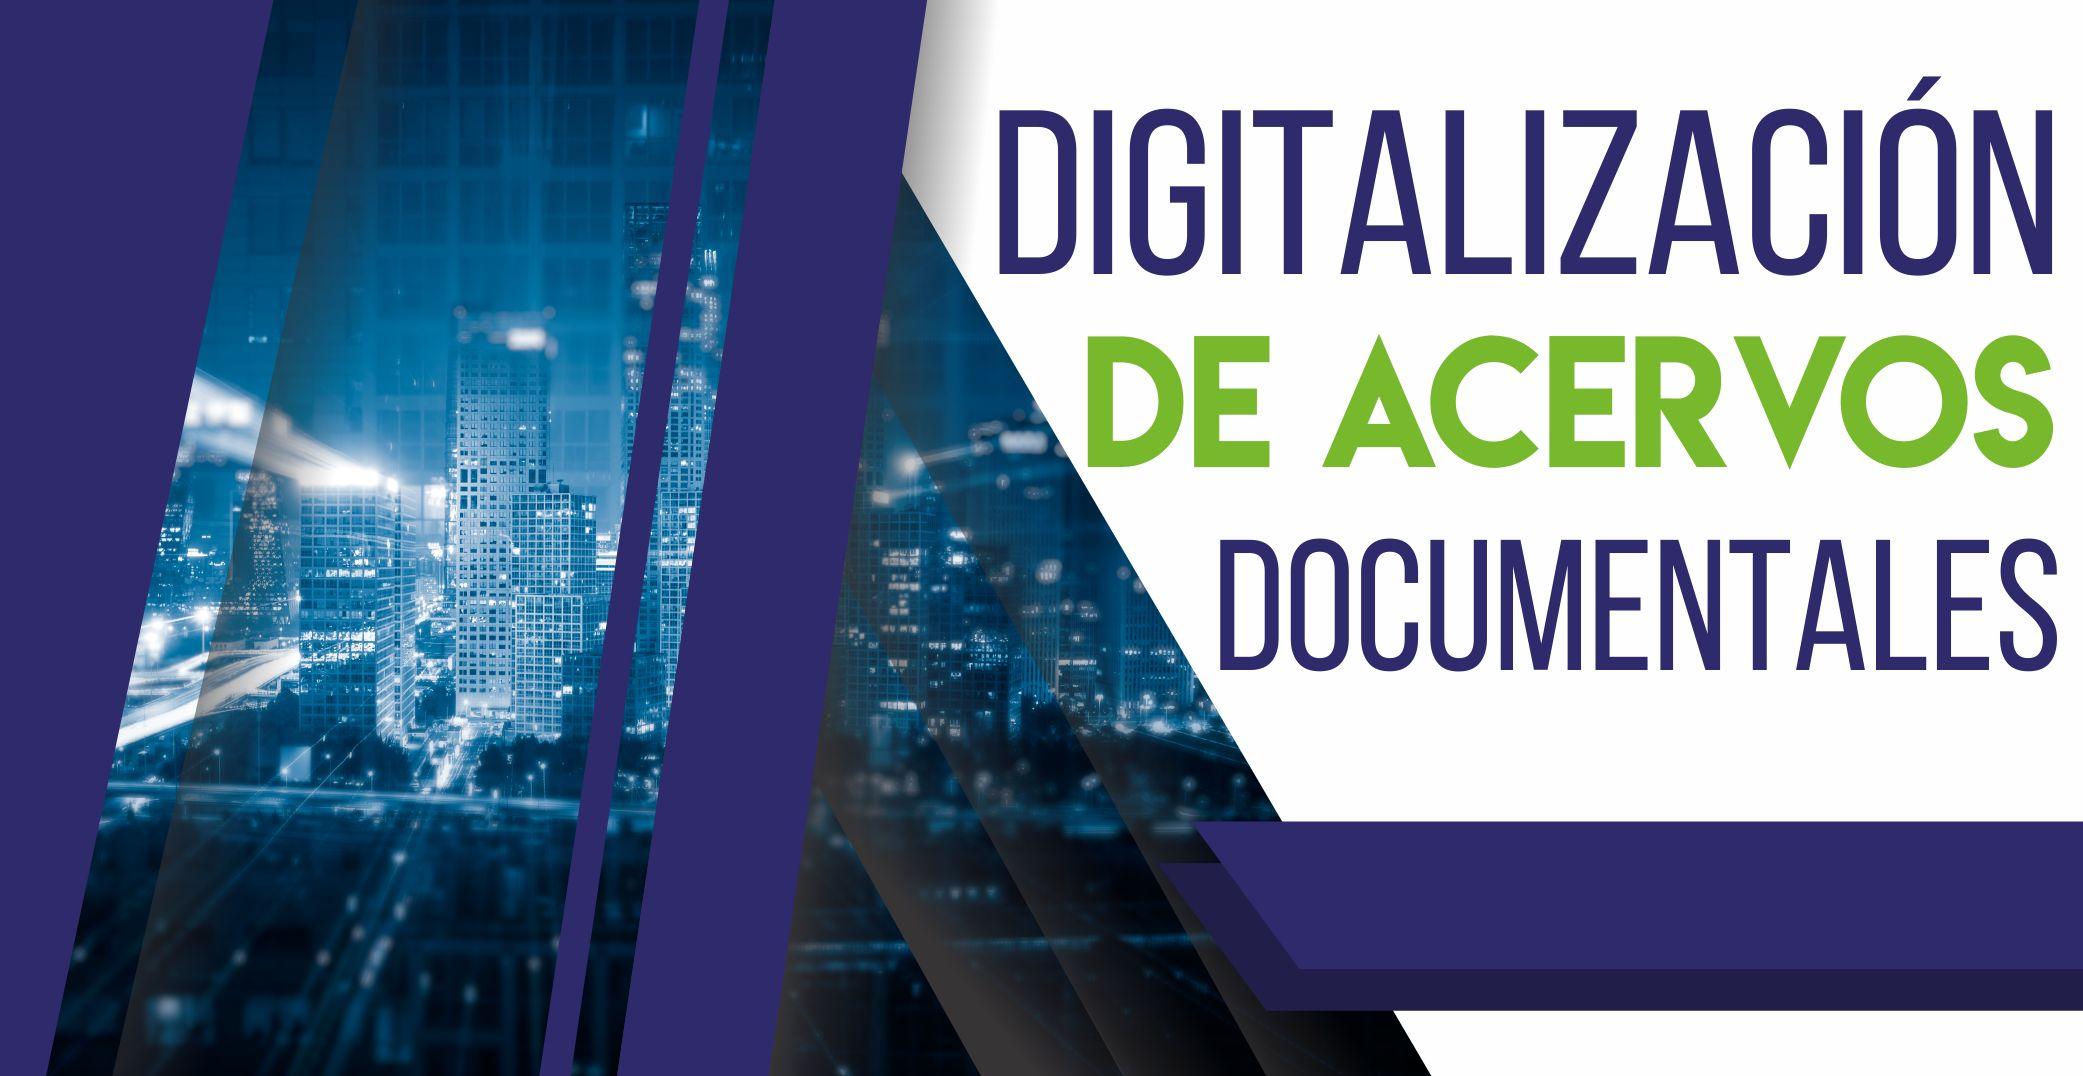 Cianet - Digitalizacion